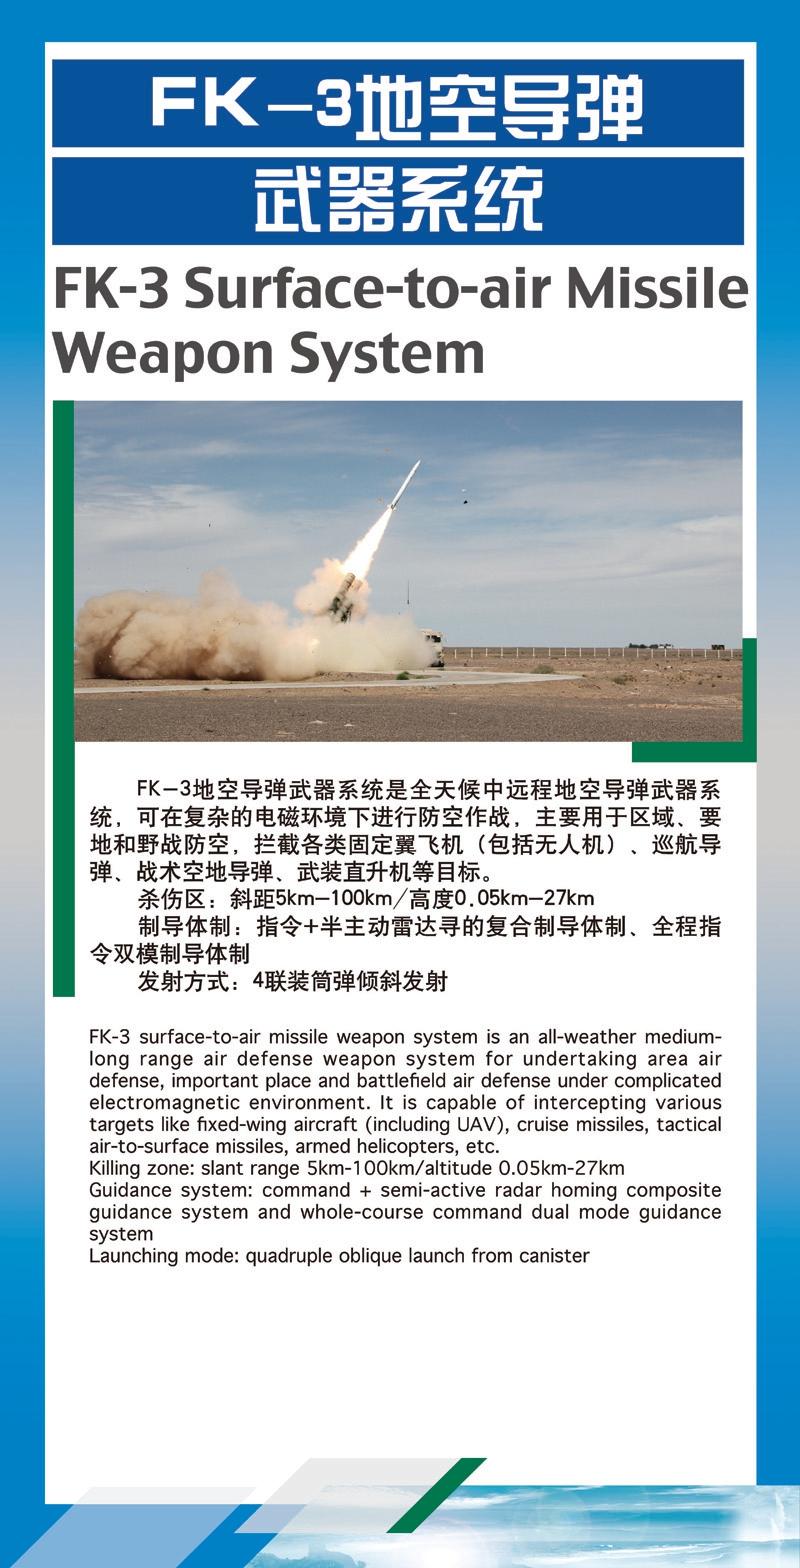 FK-3武器系统 图源:中国航天科工集团公司